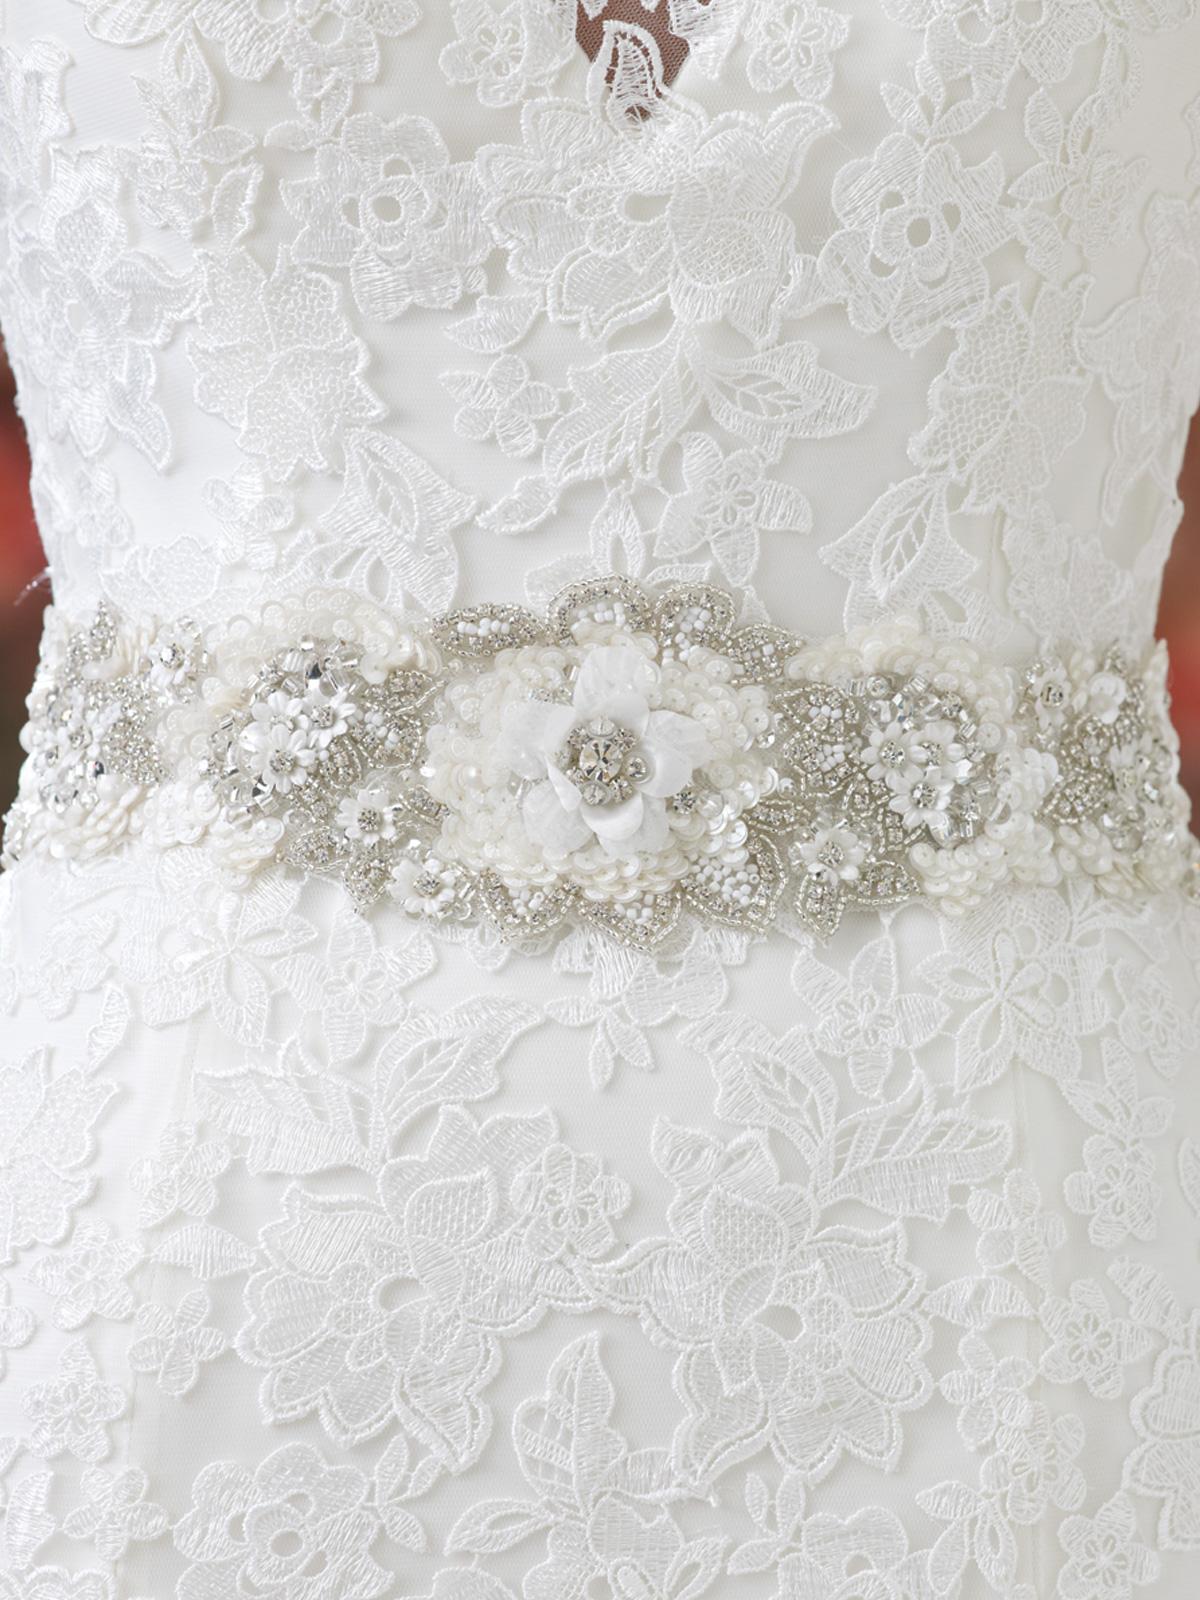 Acessorios Para Noiva - BELTS-11415